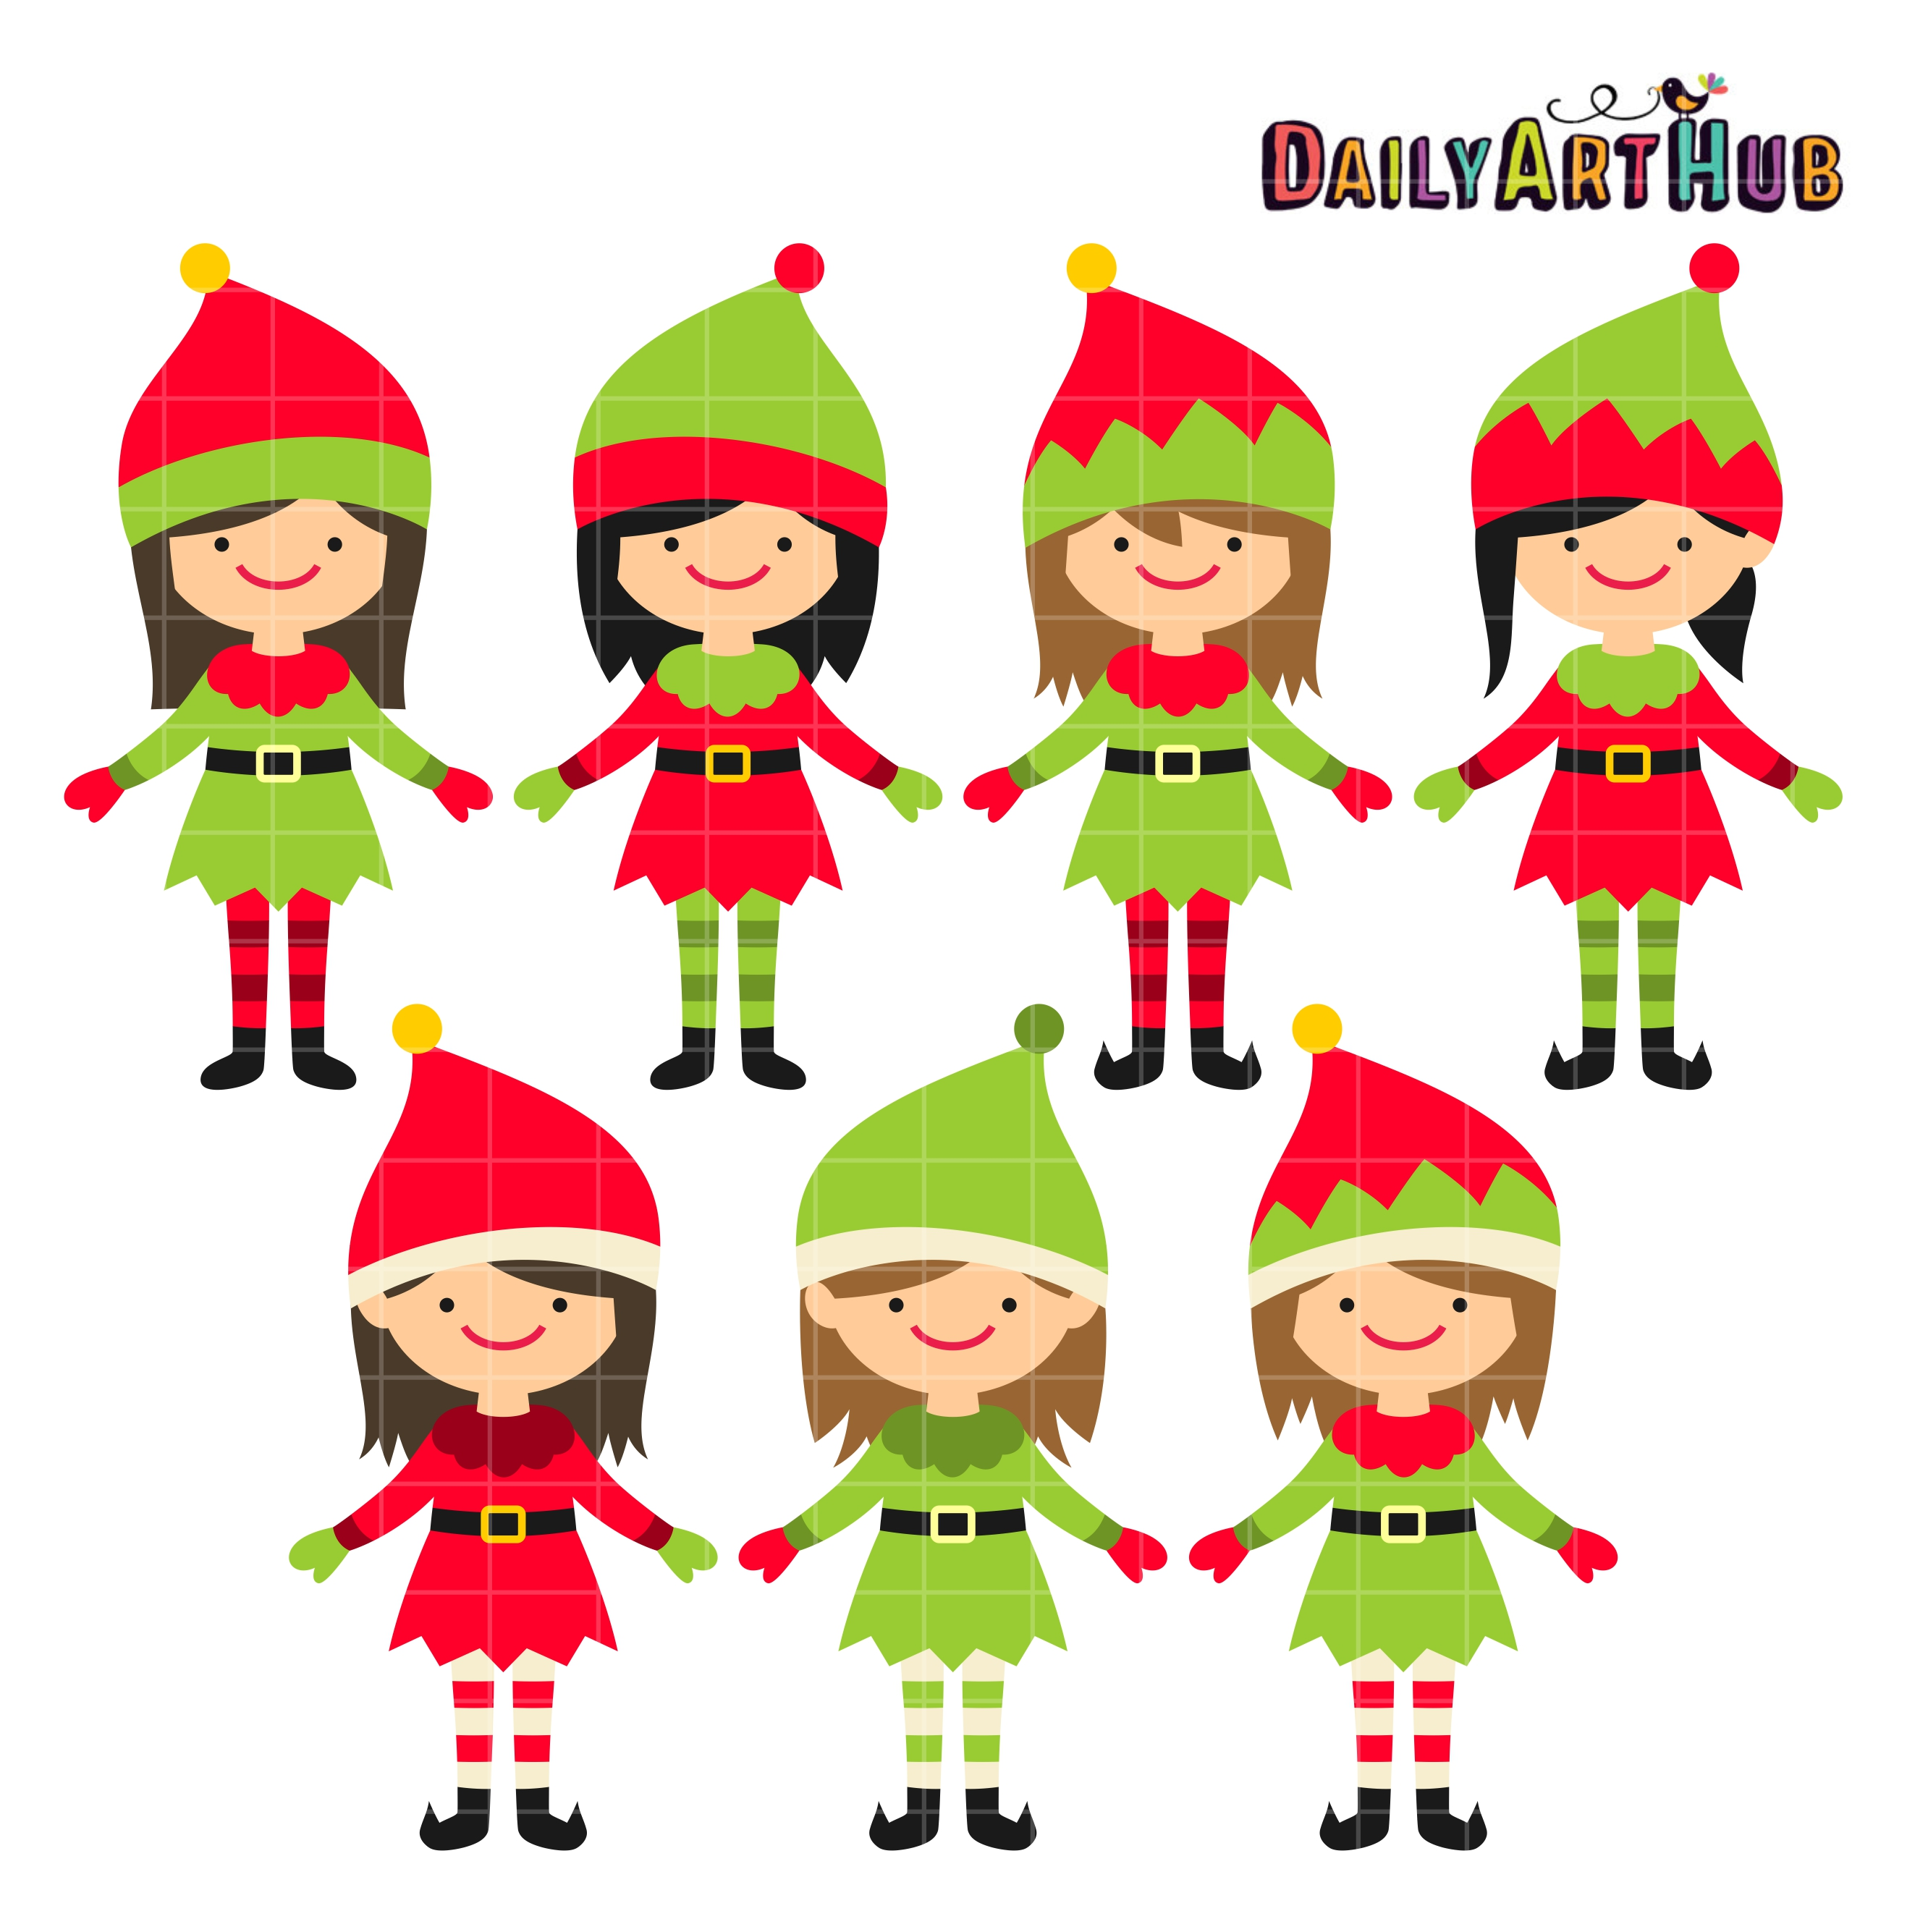 Christmas Cute Elves Clip Art Set Daily Art Hub Free